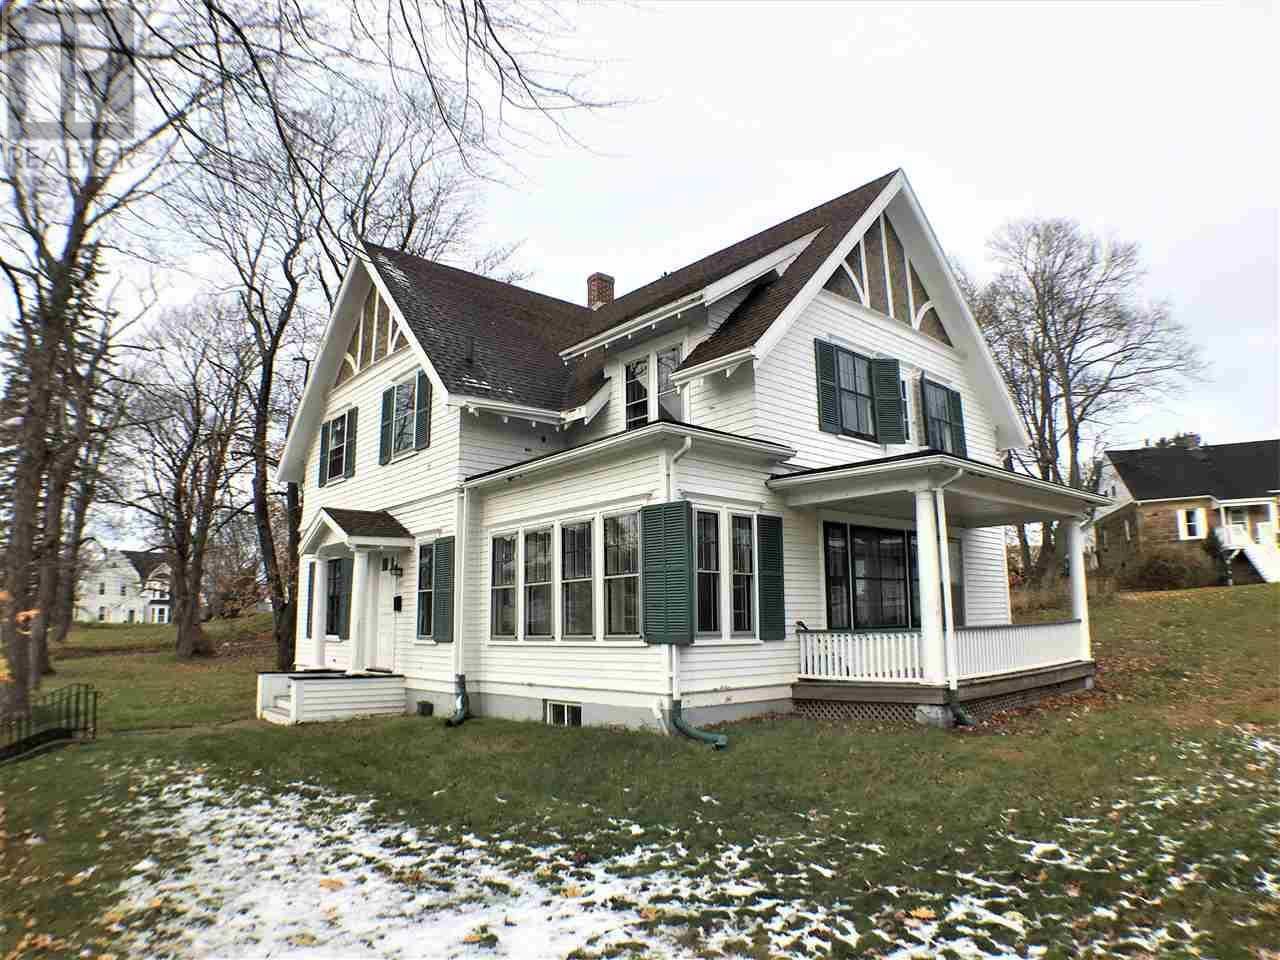 House for sale at 252 Fraser St New Glasgow Nova Scotia - MLS: 201926183